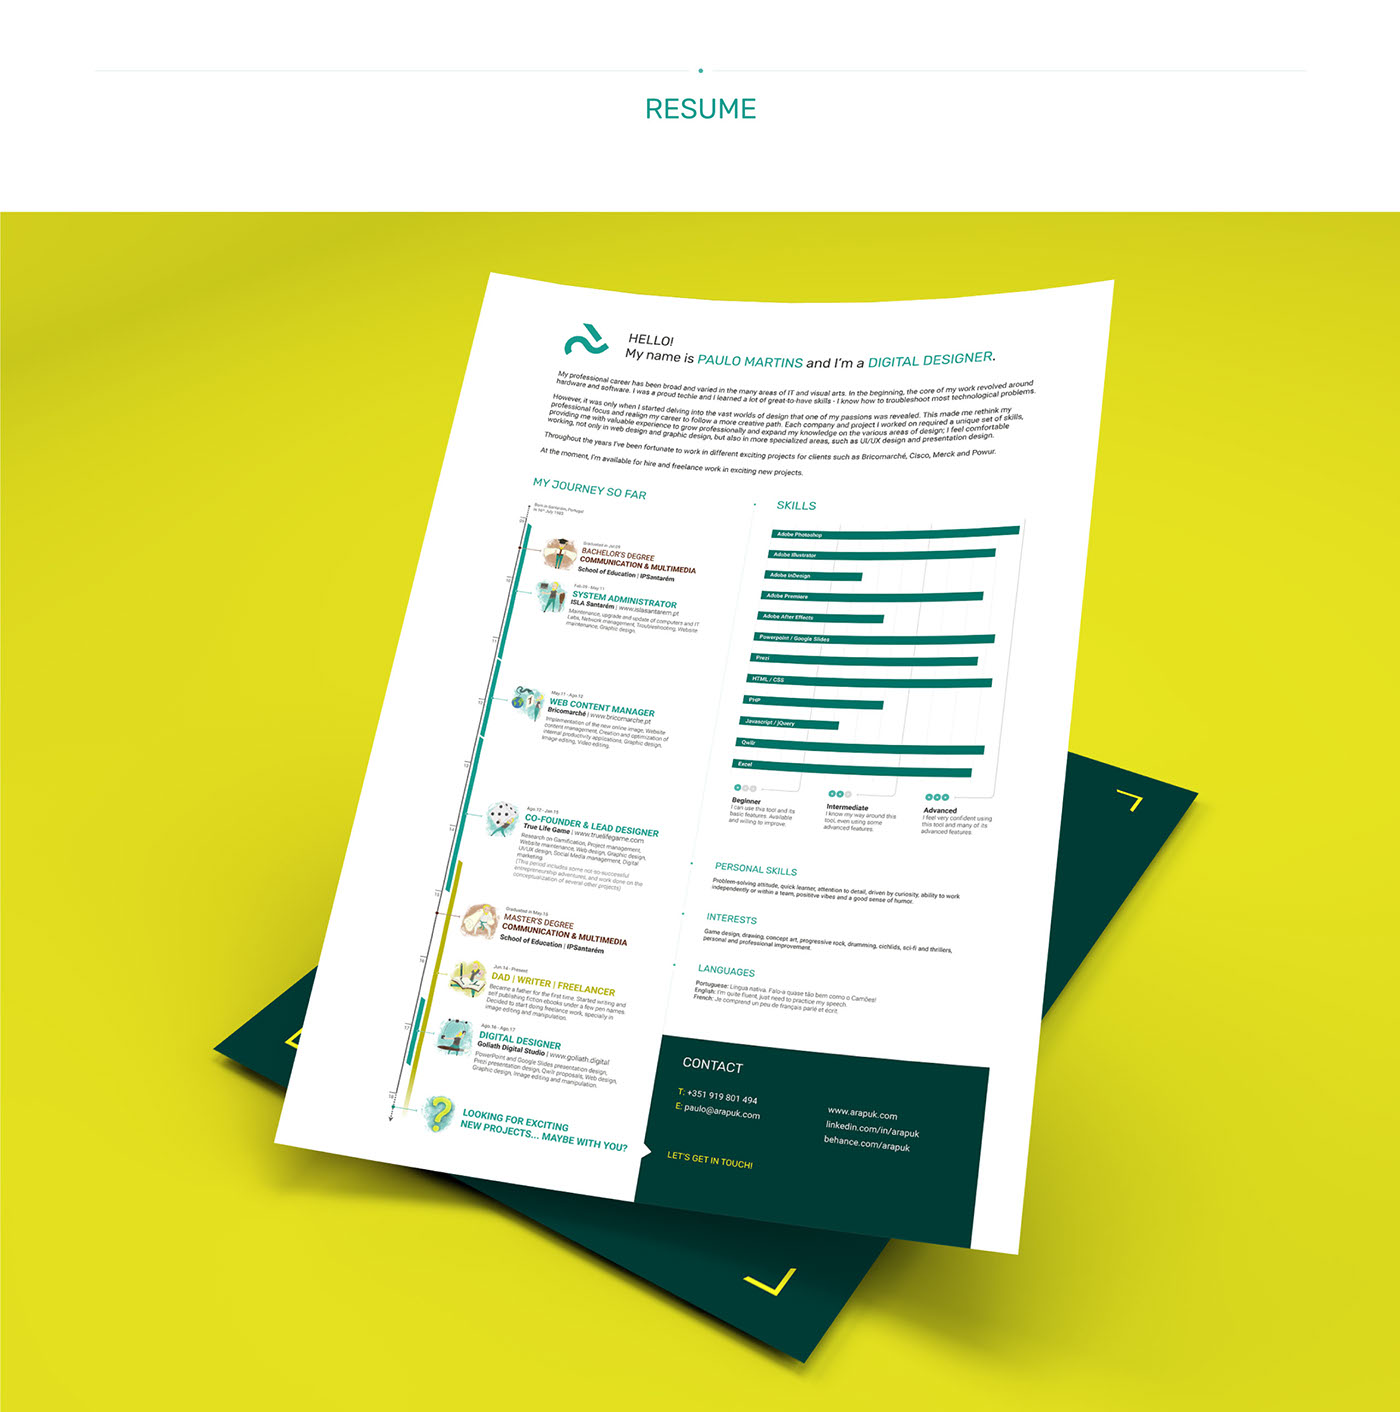 Resume Promotion Curriculum Vitae CV ILLUSTRATION  portfolio identity personal branding  logo